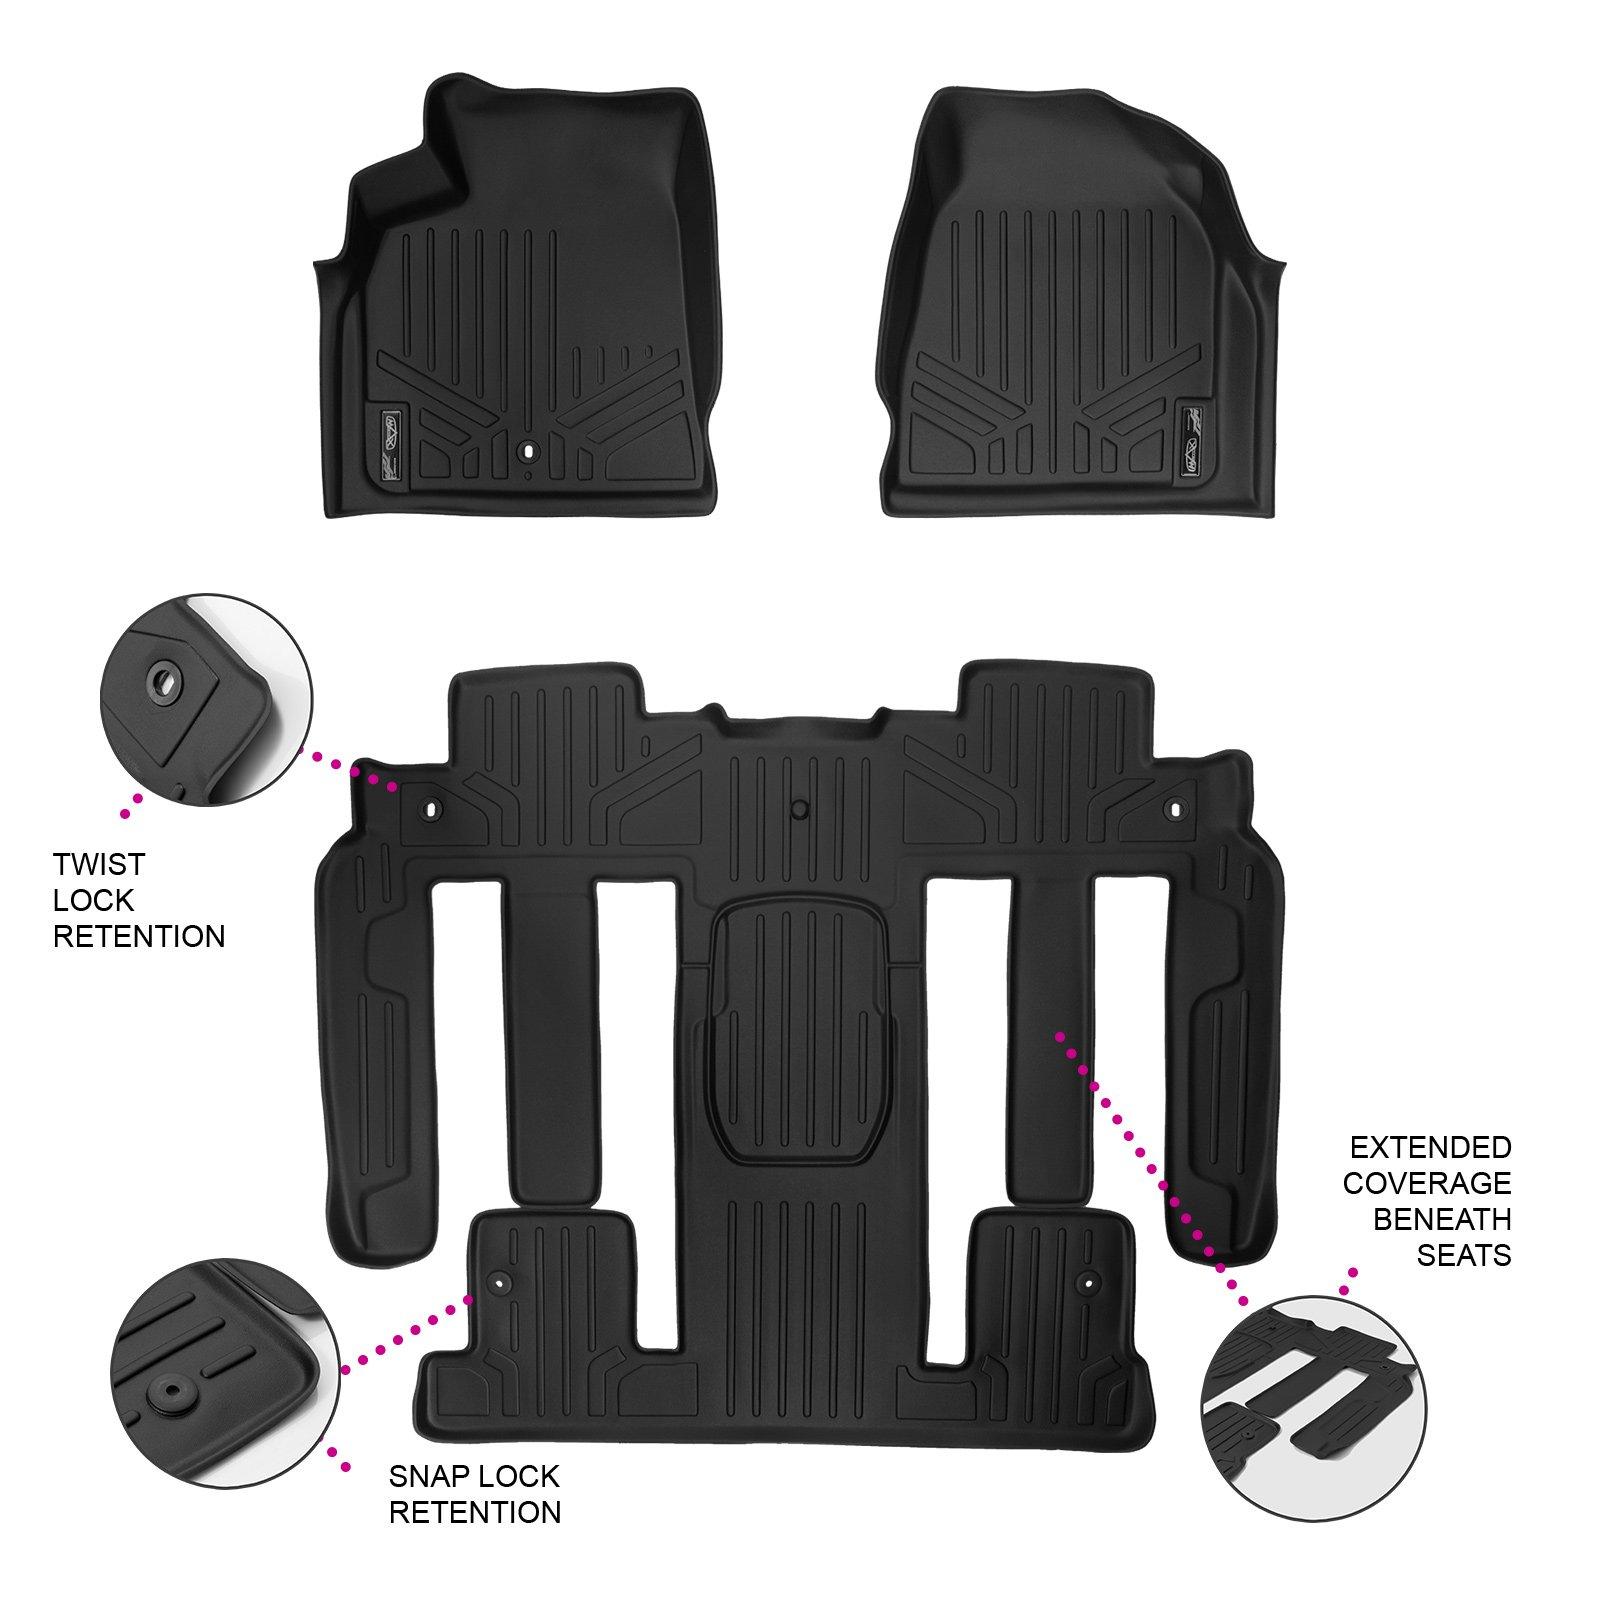 MAX LINER A0043/B0044-P MAXFLOORMAT Floor Mats for Traverse/Enclave/Acadia/Outlook Bucket Seat Complete Premium Set (Black)